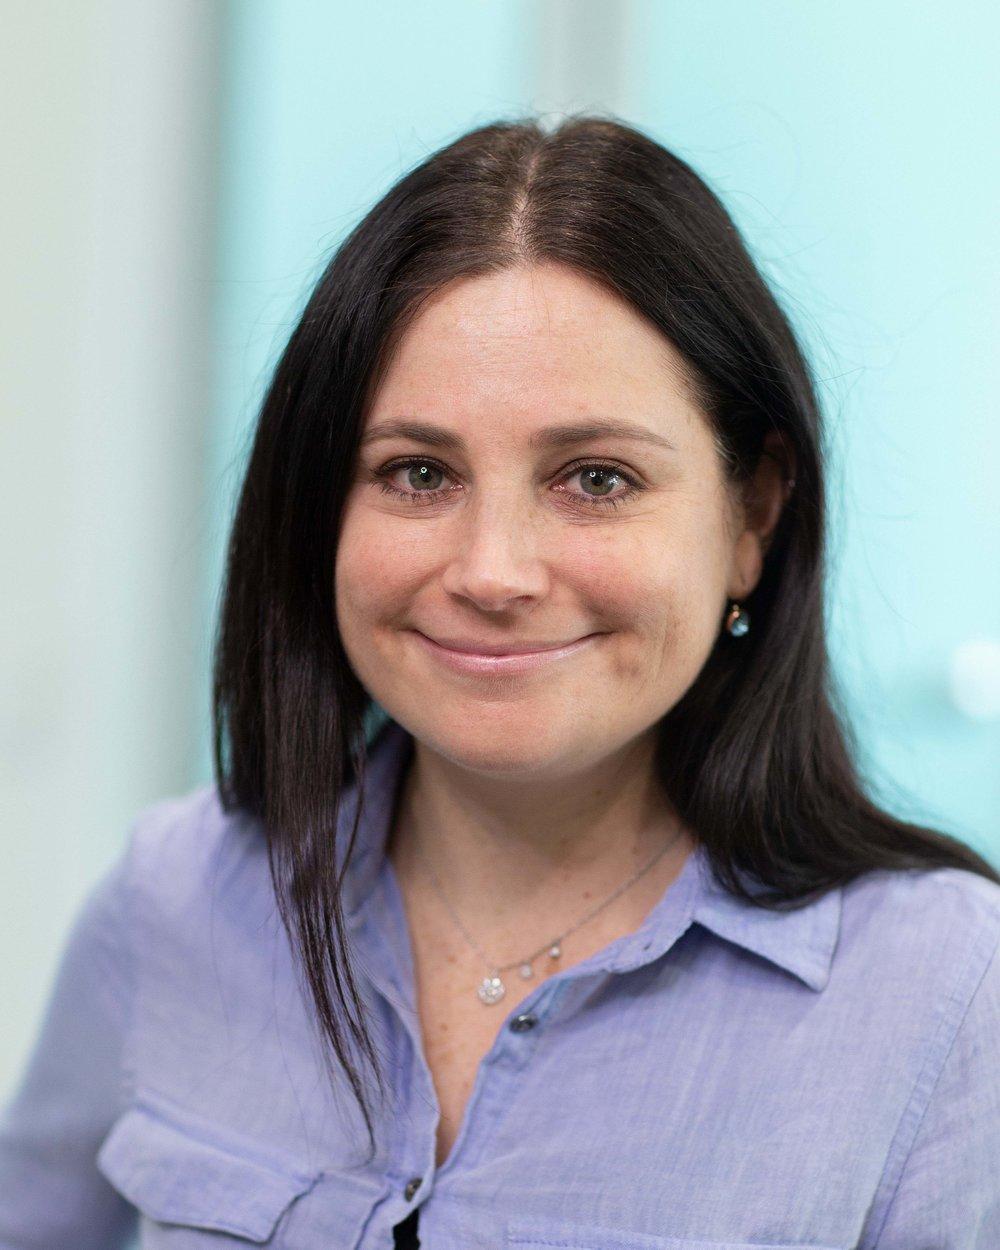 Karin Eichholz; keichhole@baskinclakepriest.com.au.jpg